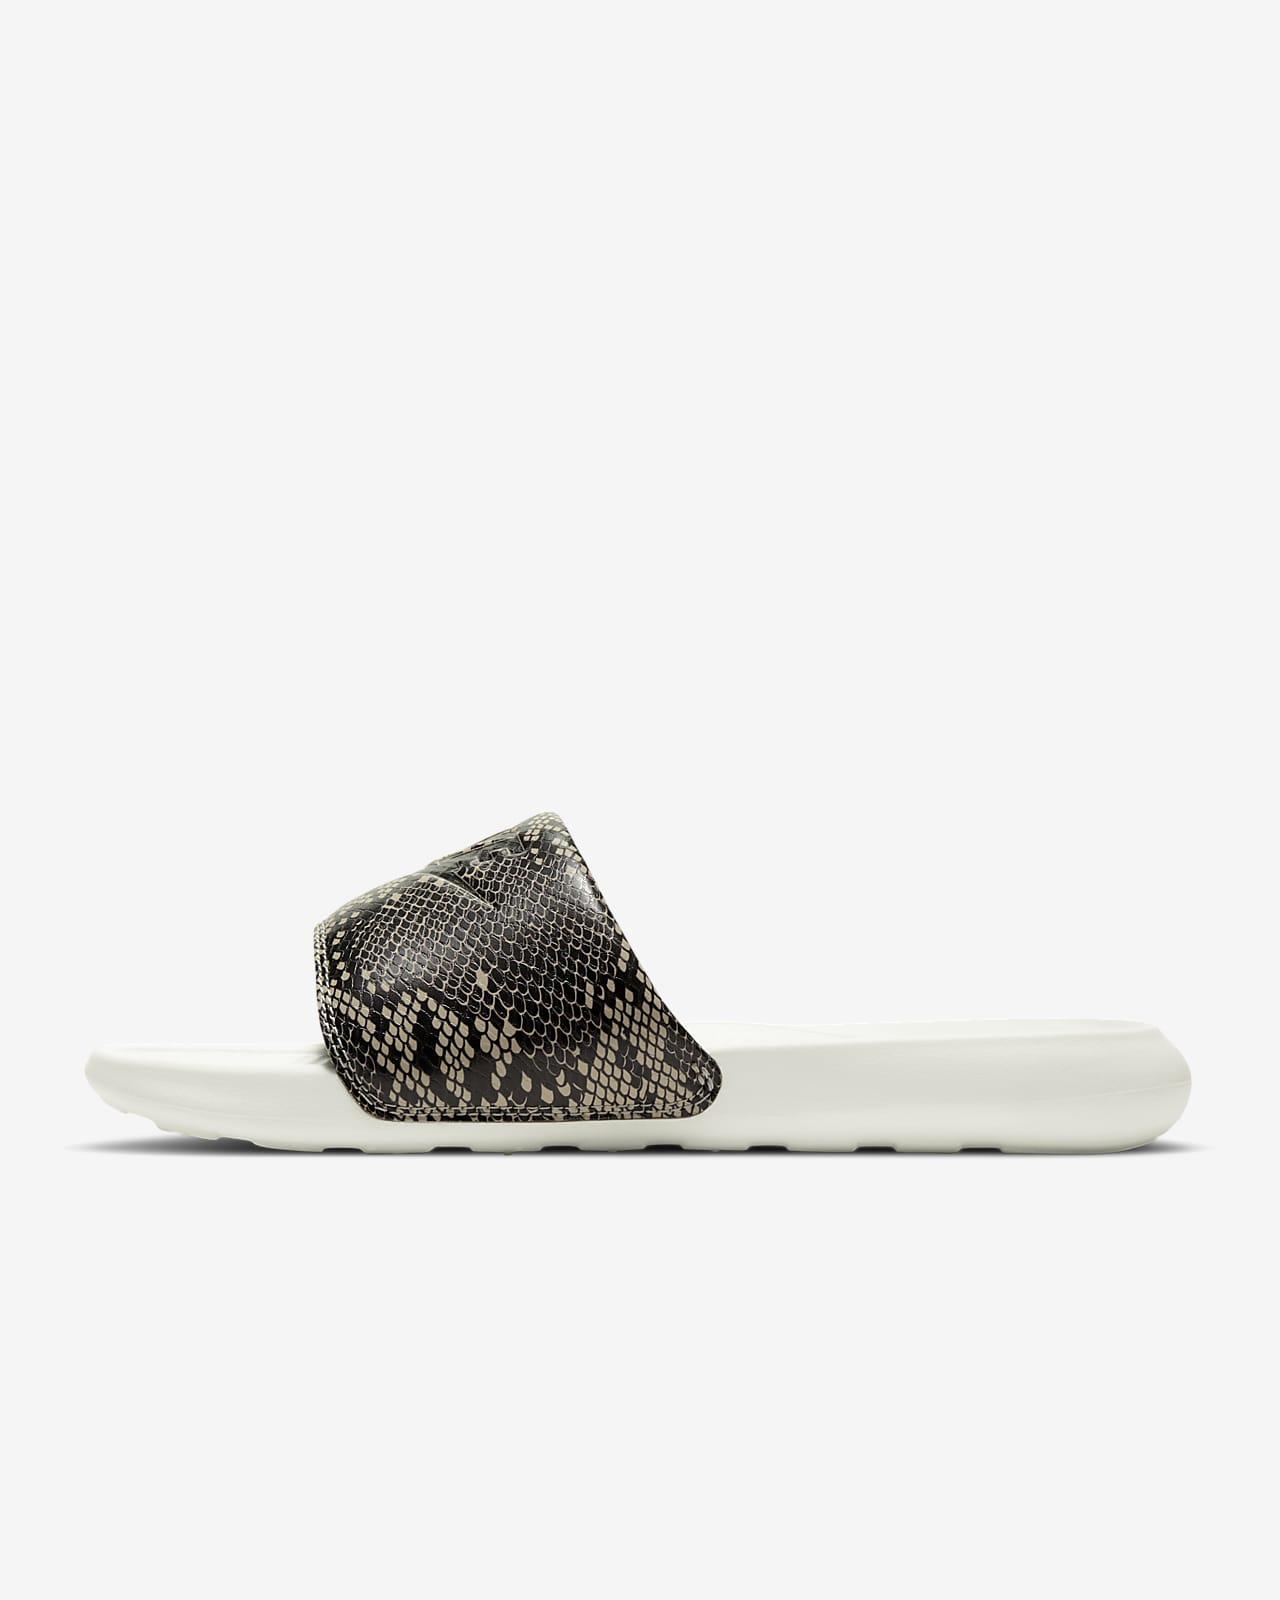 Nike Victori One Women's Print Slides